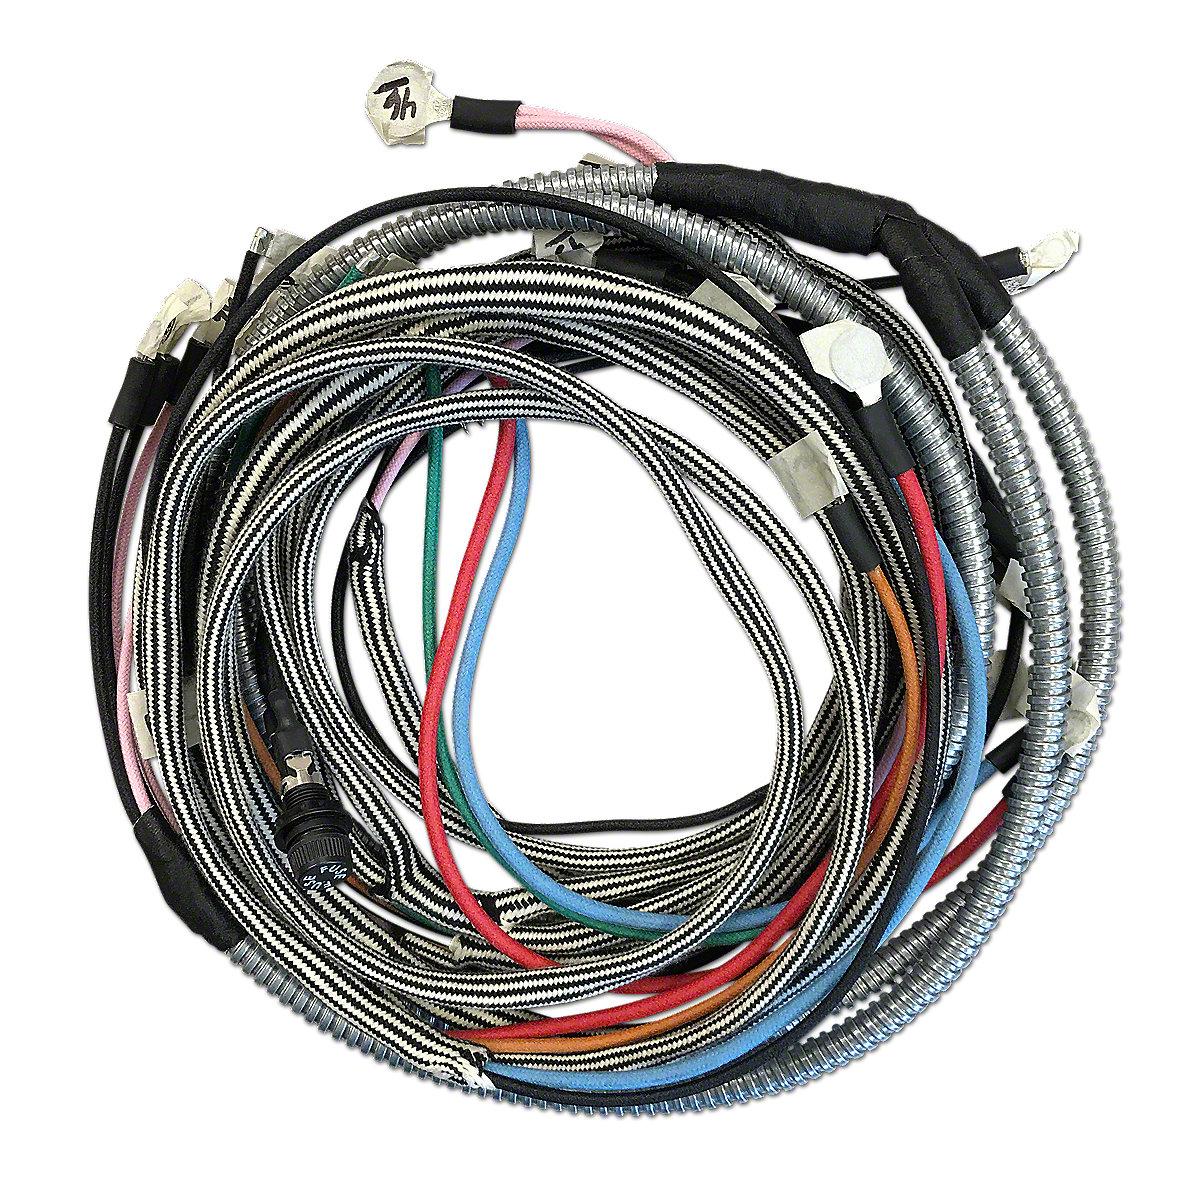 farmall 450 wiring harness wiring library rh uitgeverijdewereld nl